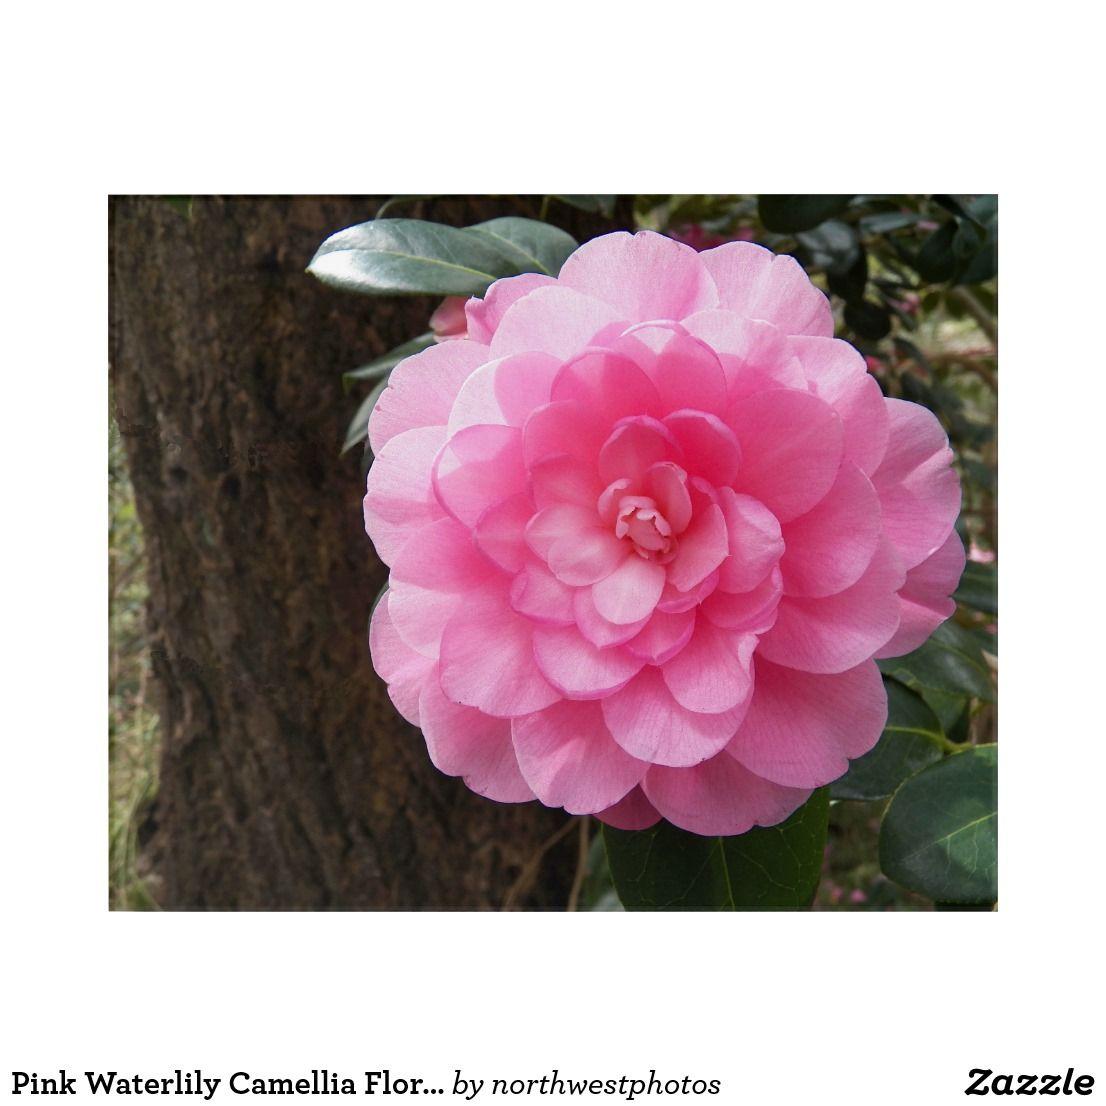 Pink waterlily camellia floral acrylic wall art acrylic wall art